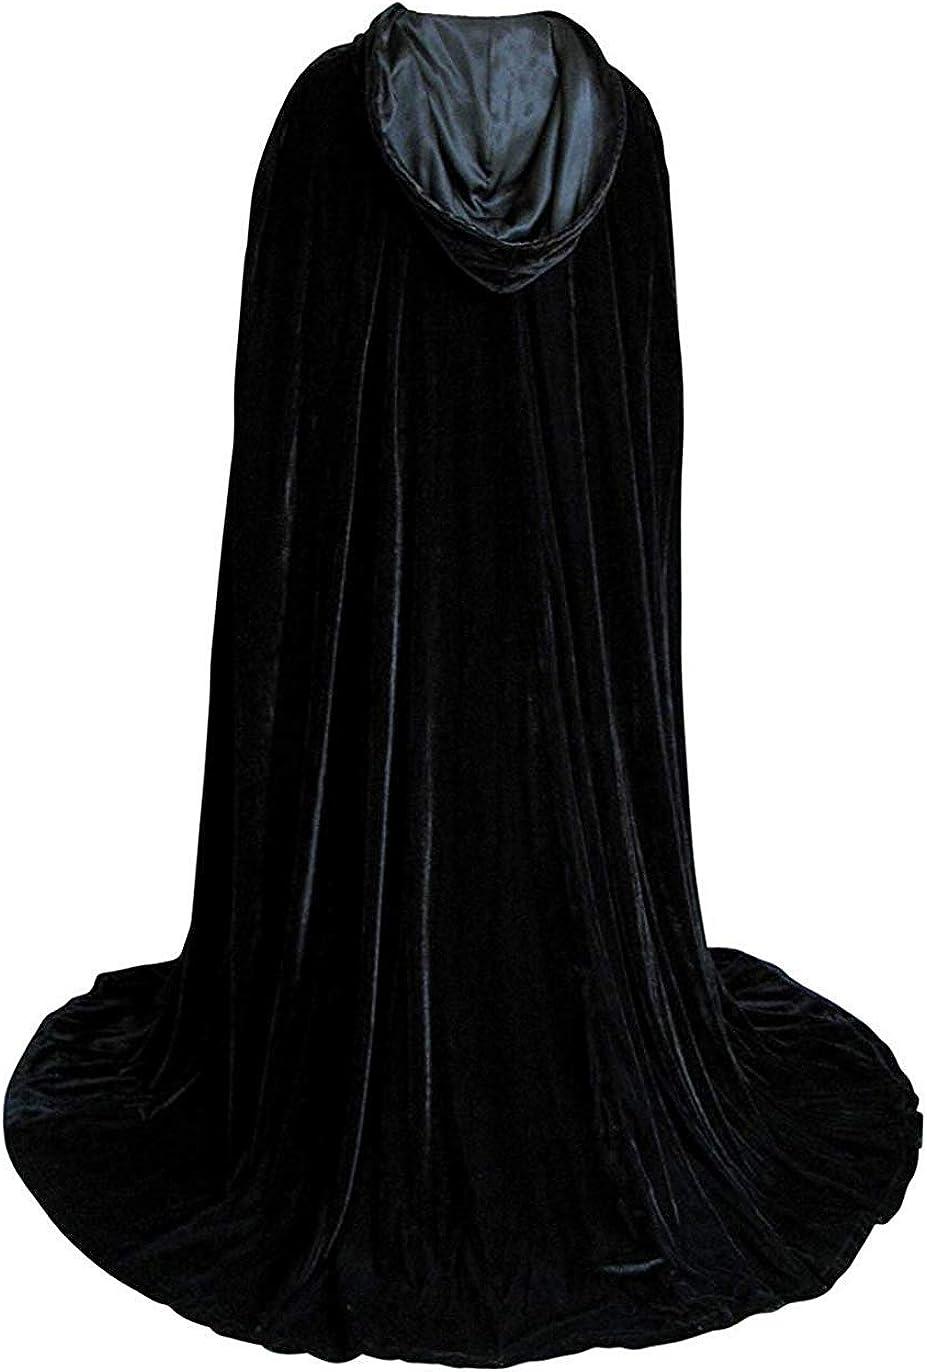 Engerla Bridal Halloween Costumes Hooded Cloak Velvet Cloak Black Cape Unisex Cosplay Capes